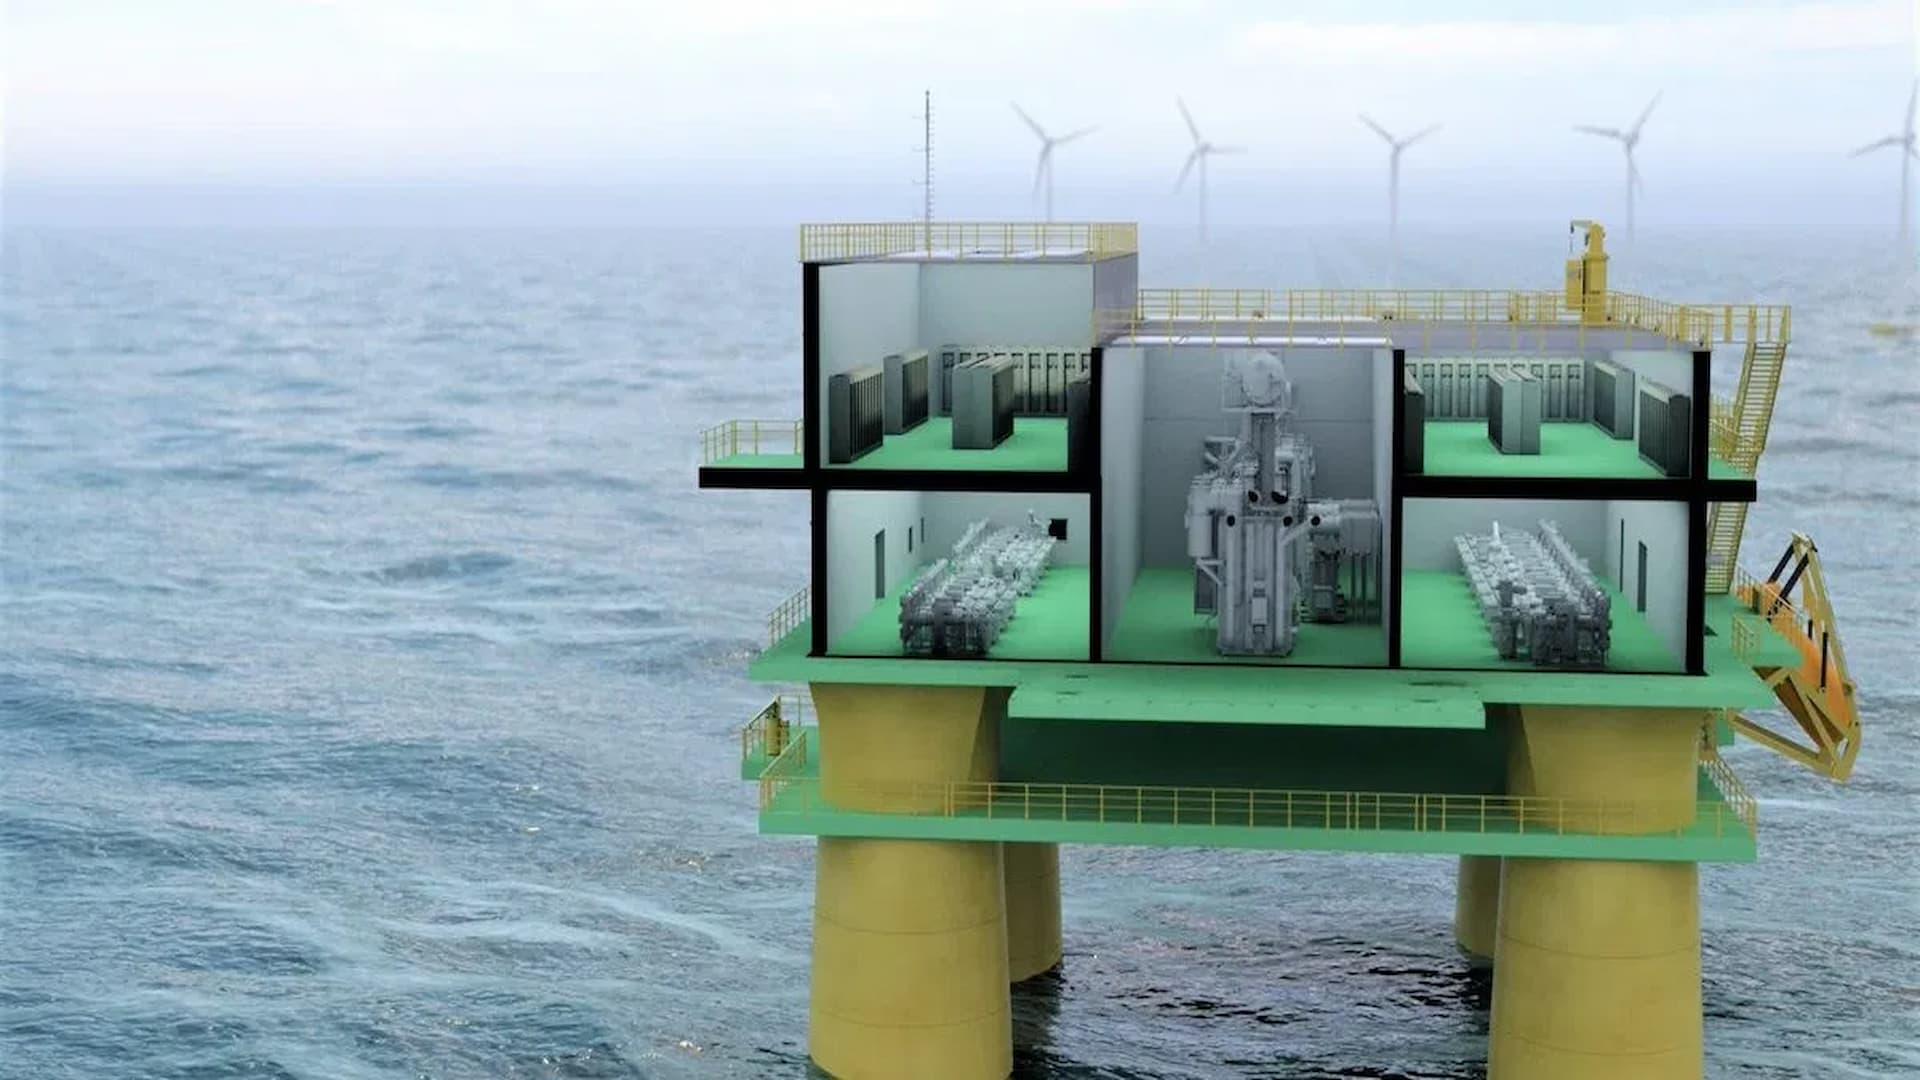 Floating wind energy